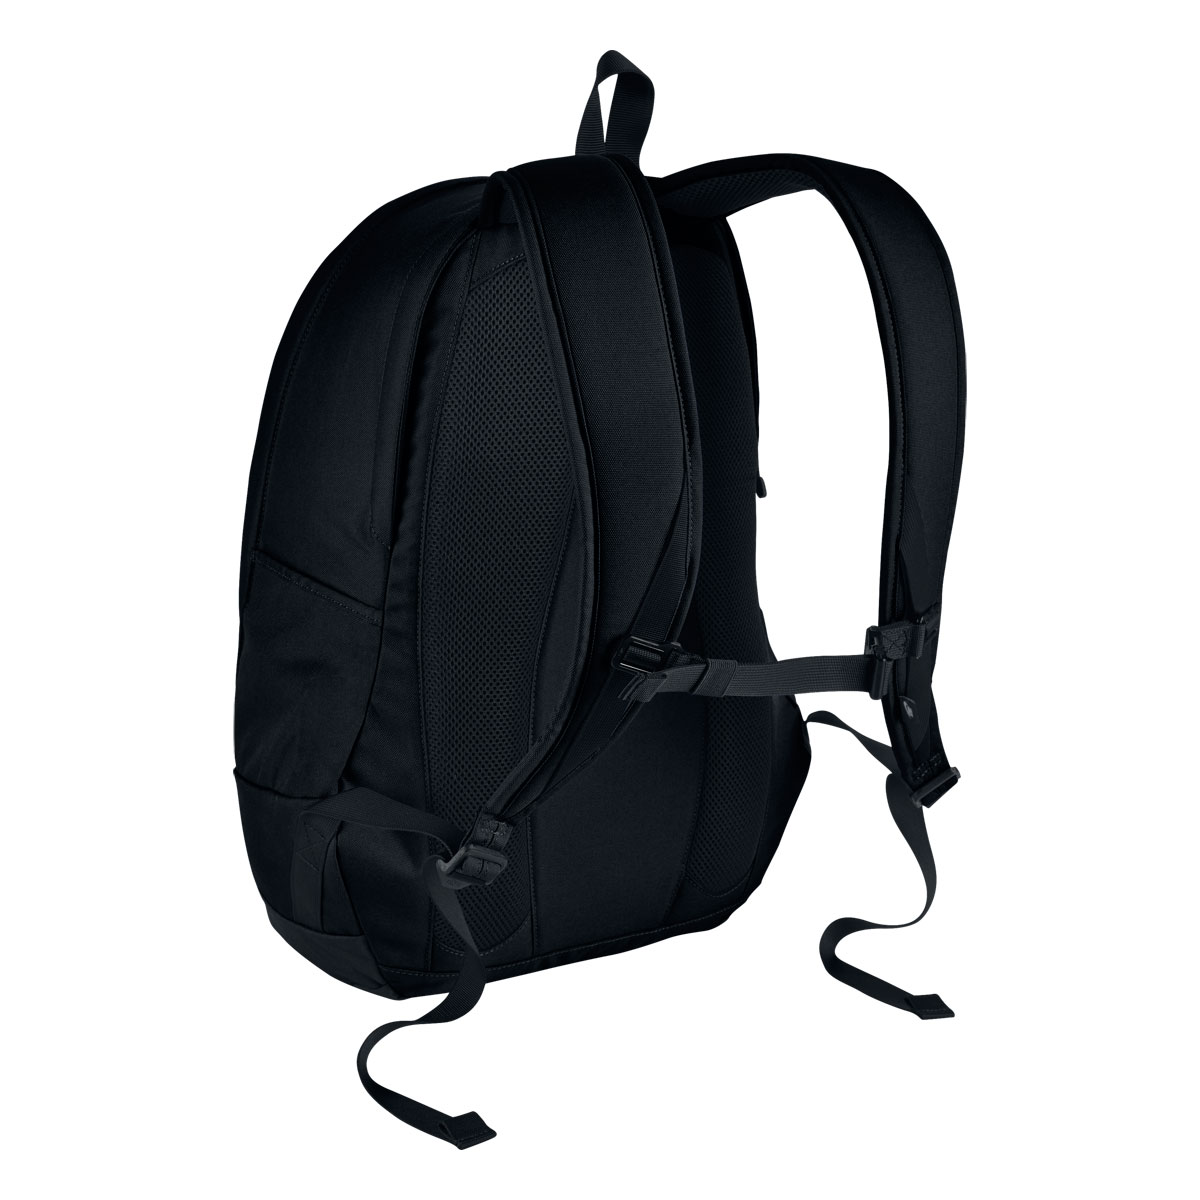 f124c6f1b10 ... NIKE NK CHYN BKPK - SOLID (Nike NSW Cheyenne 3.0 solid backpack) BLACK/  ...